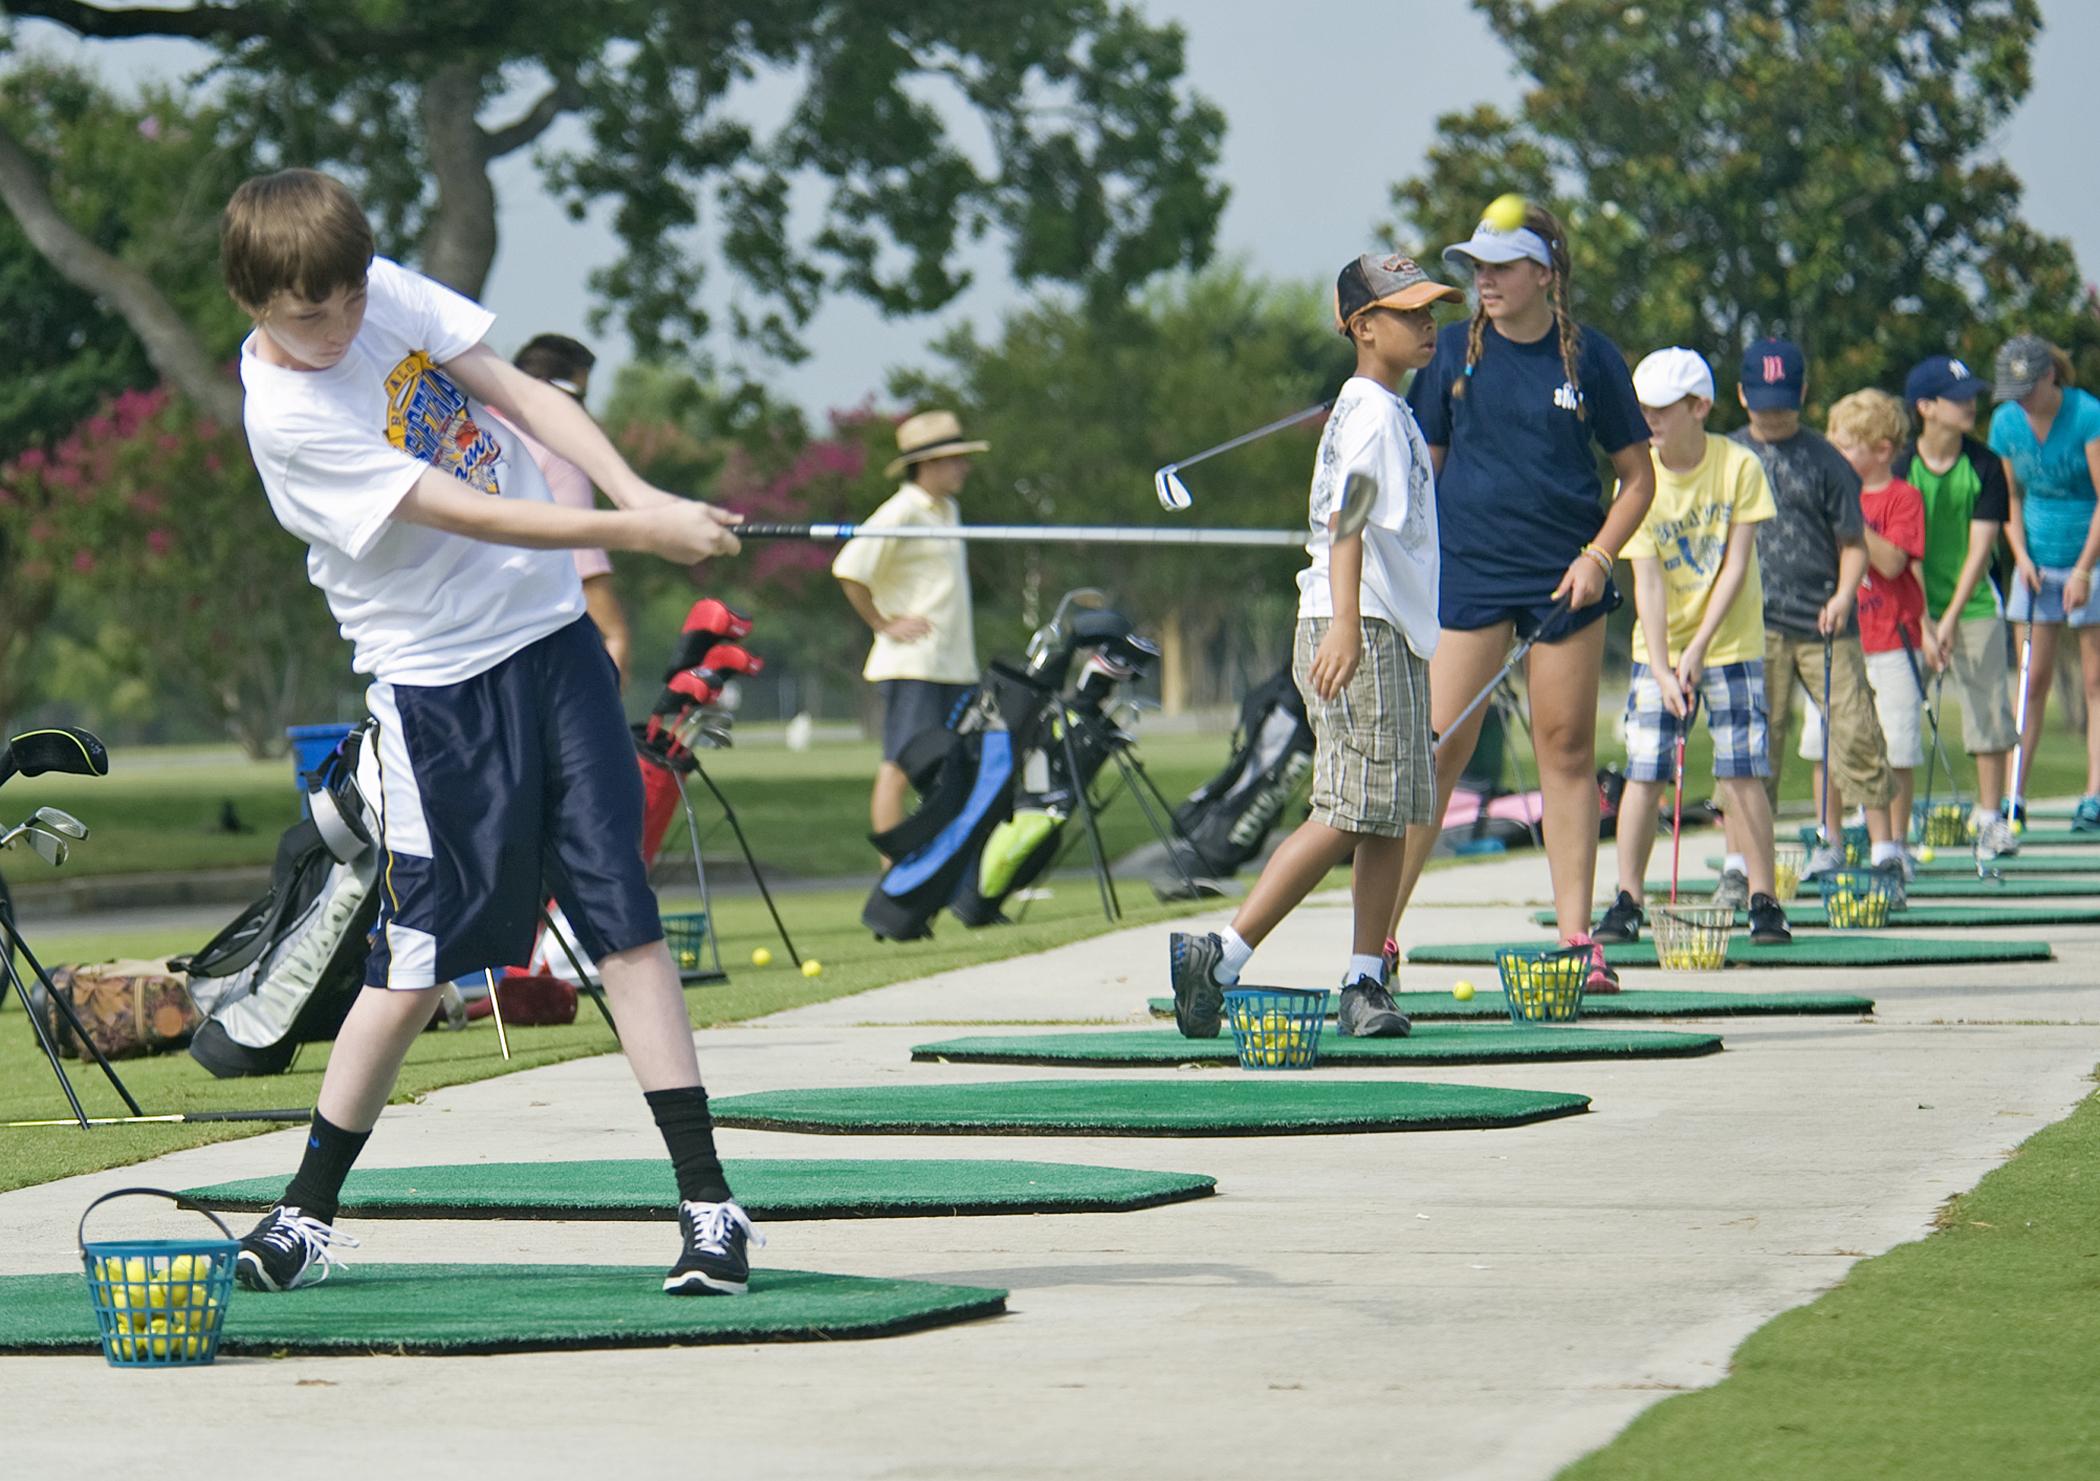 https://upload.wikimedia.org/wikipedia/commons/0/05/Annual_Junior_Golf_Clinic_120613-F-ST721-274.jpg